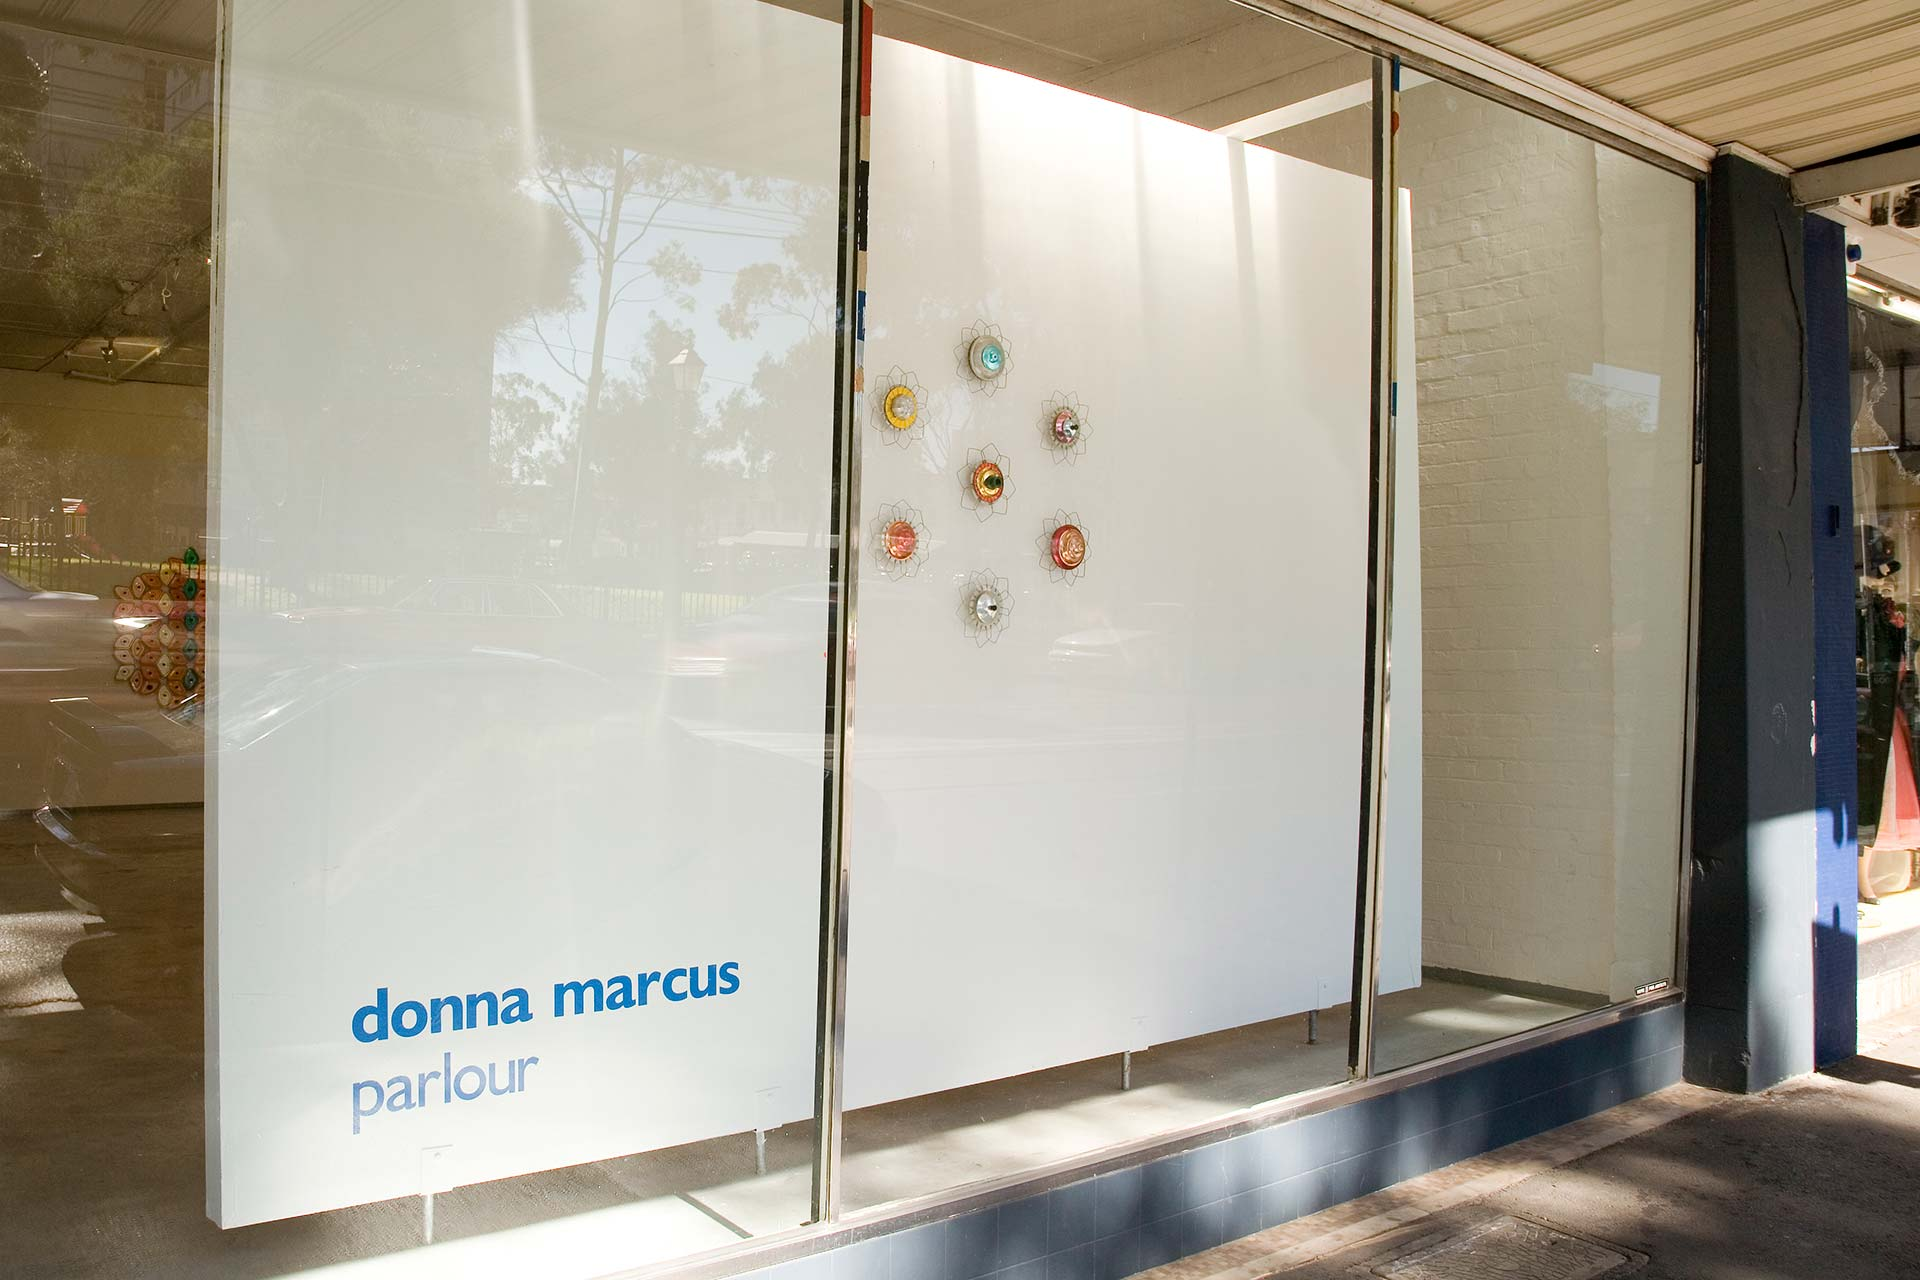 2006-Parlour-Exhibition-Donna-Marcus-Dianne-Tanzer-1-1920px